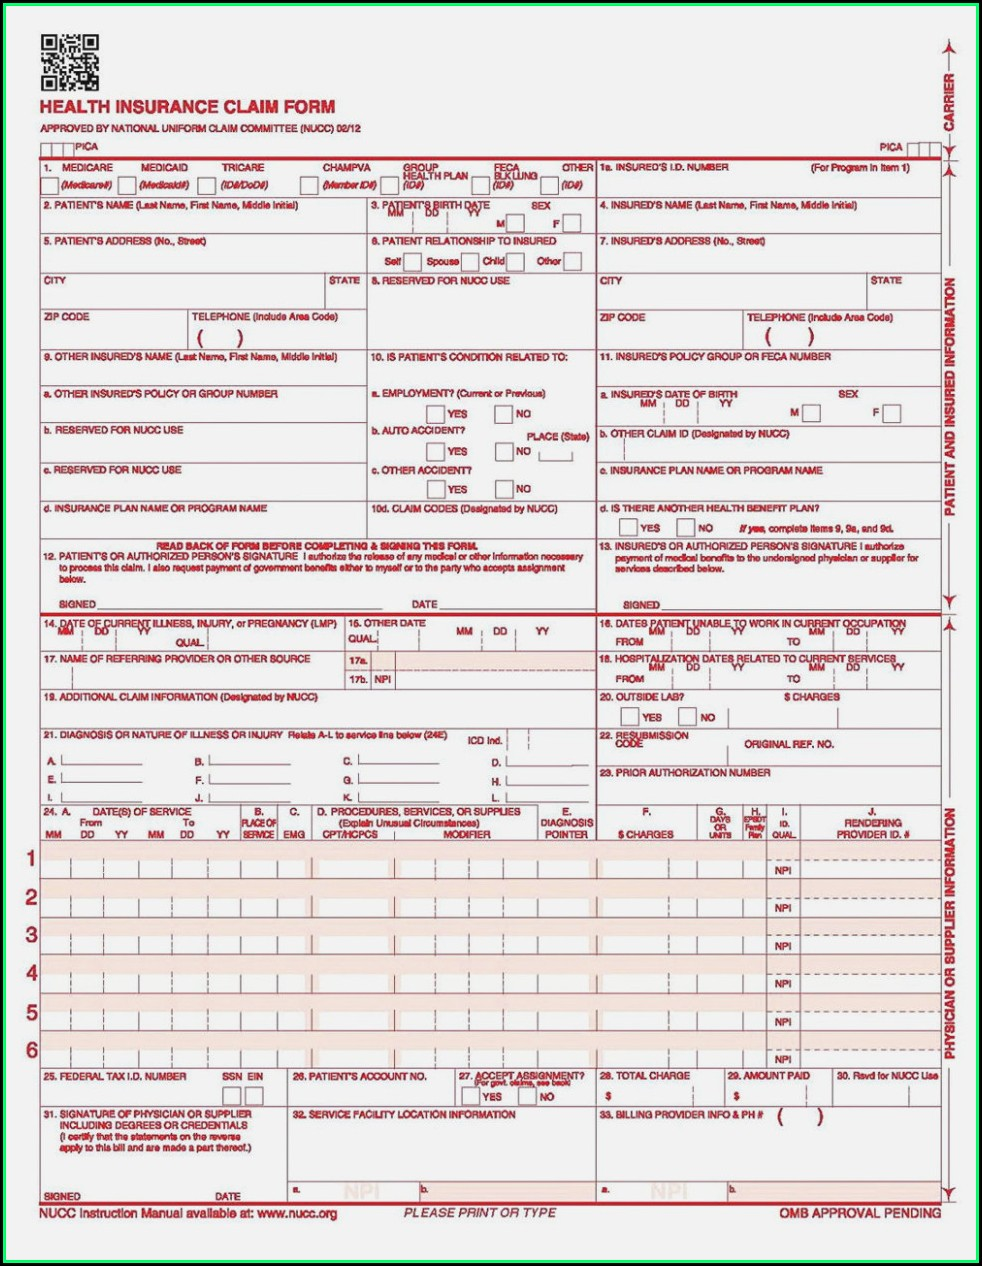 Free Blank Cms 1500 Form